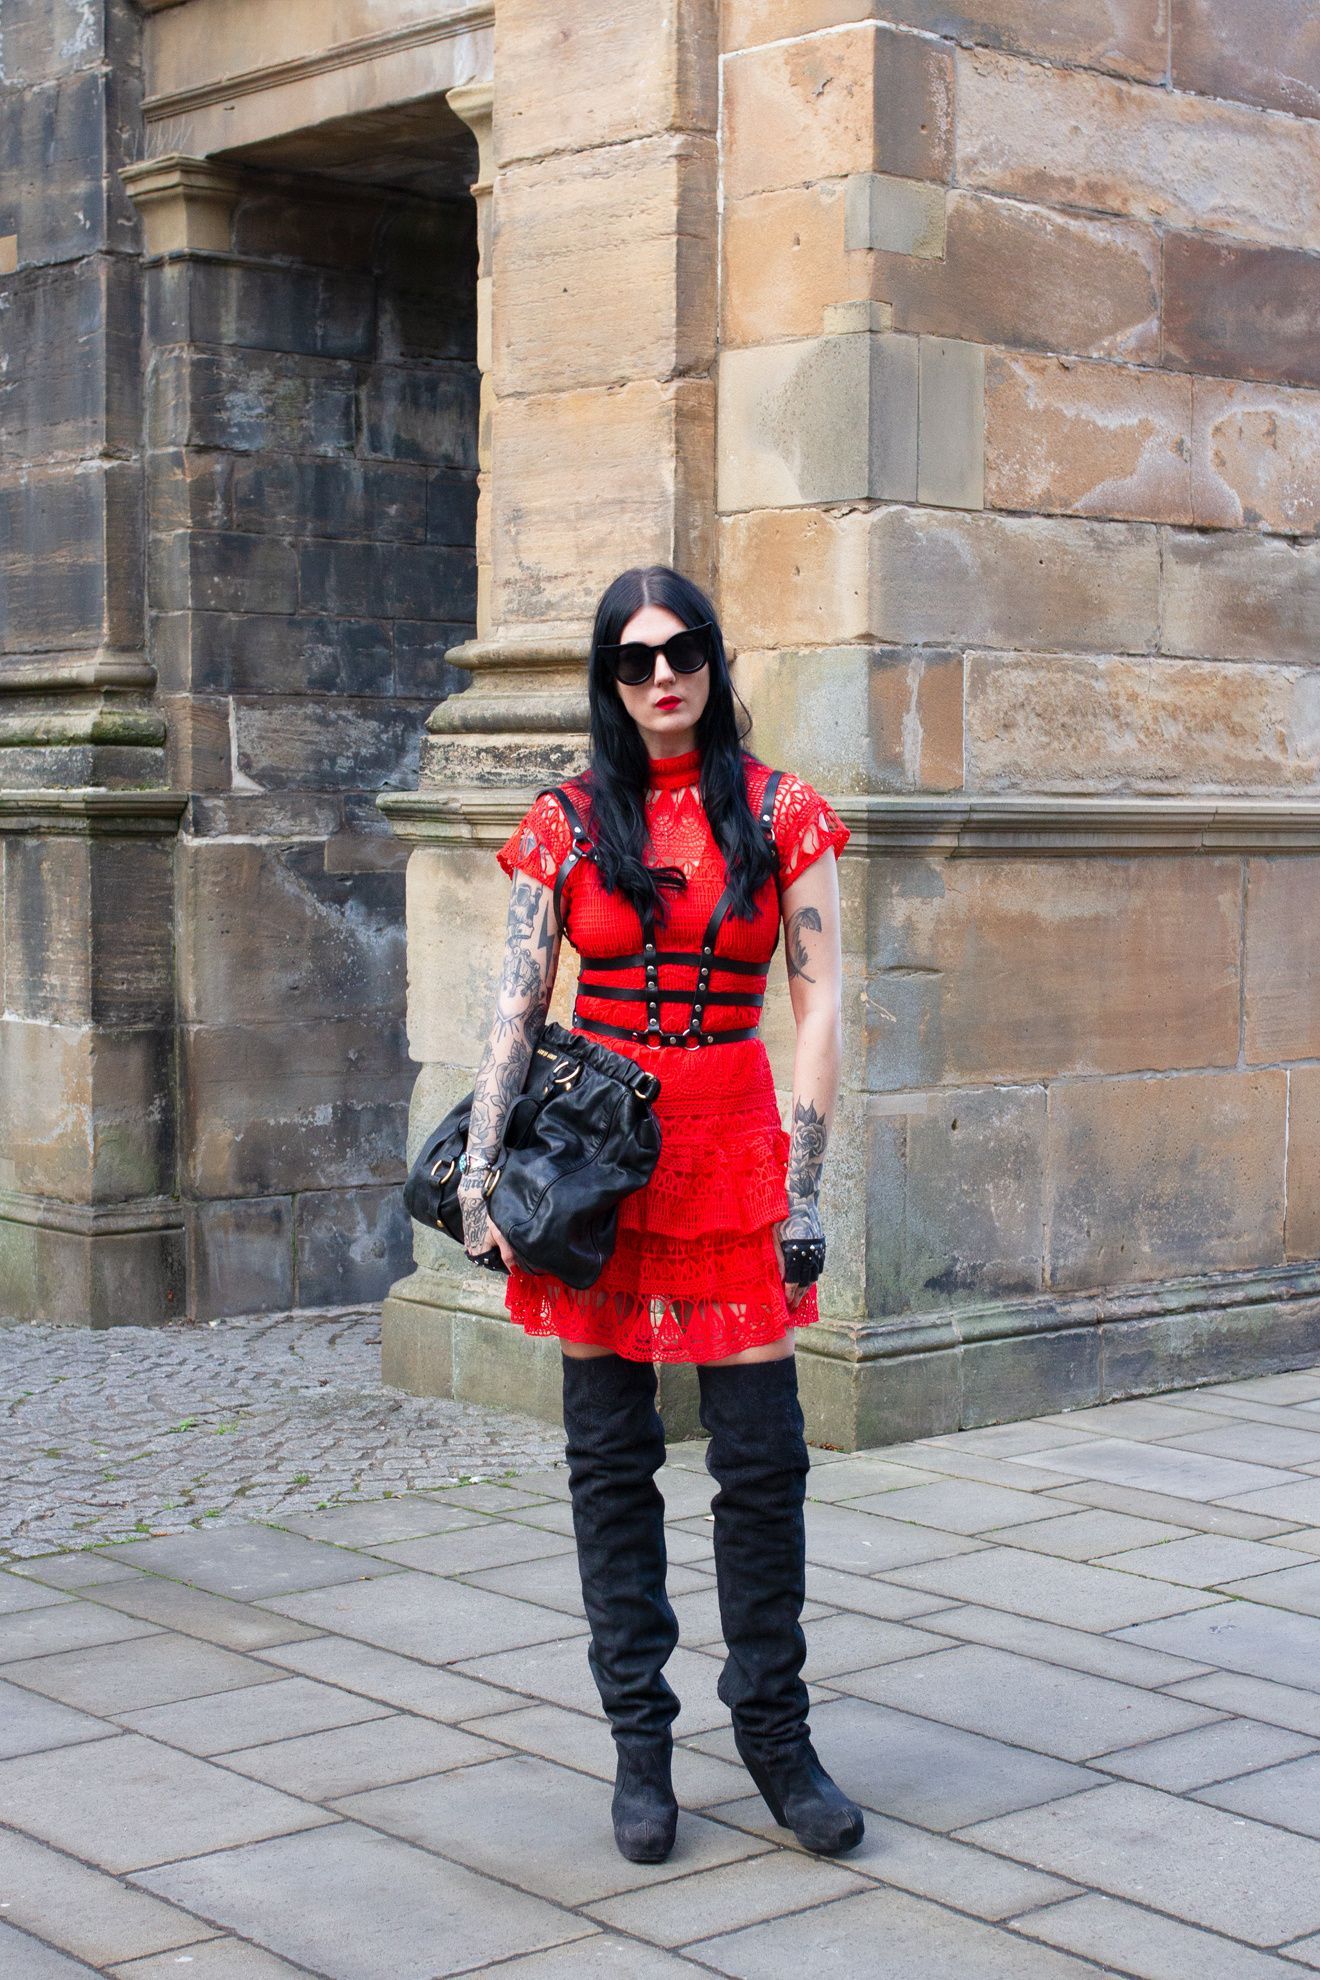 reddress-2.jpg